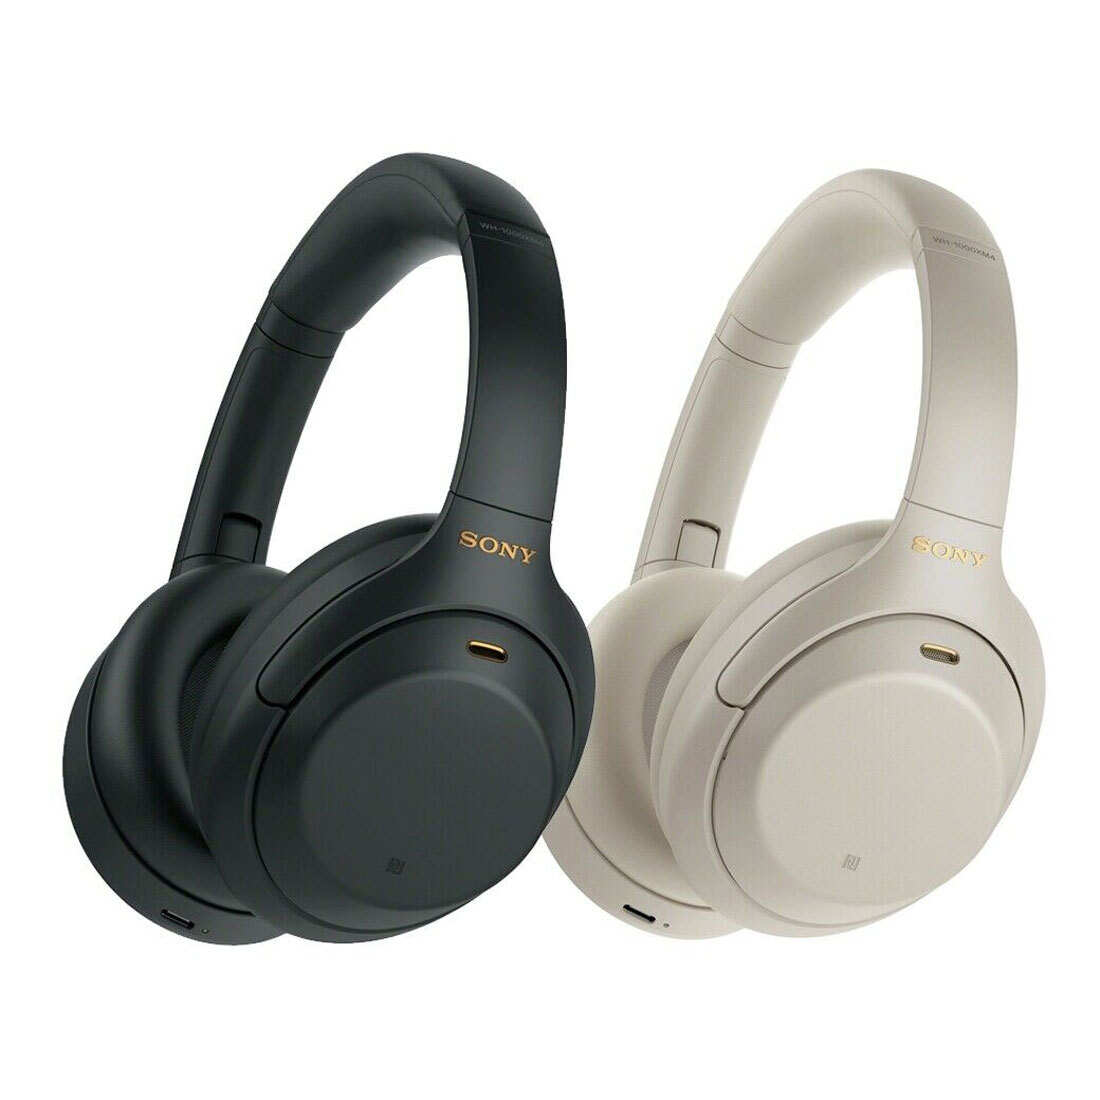 Sony WH-1000XM4 Wireless Noise Cancelling Headphones | eBay